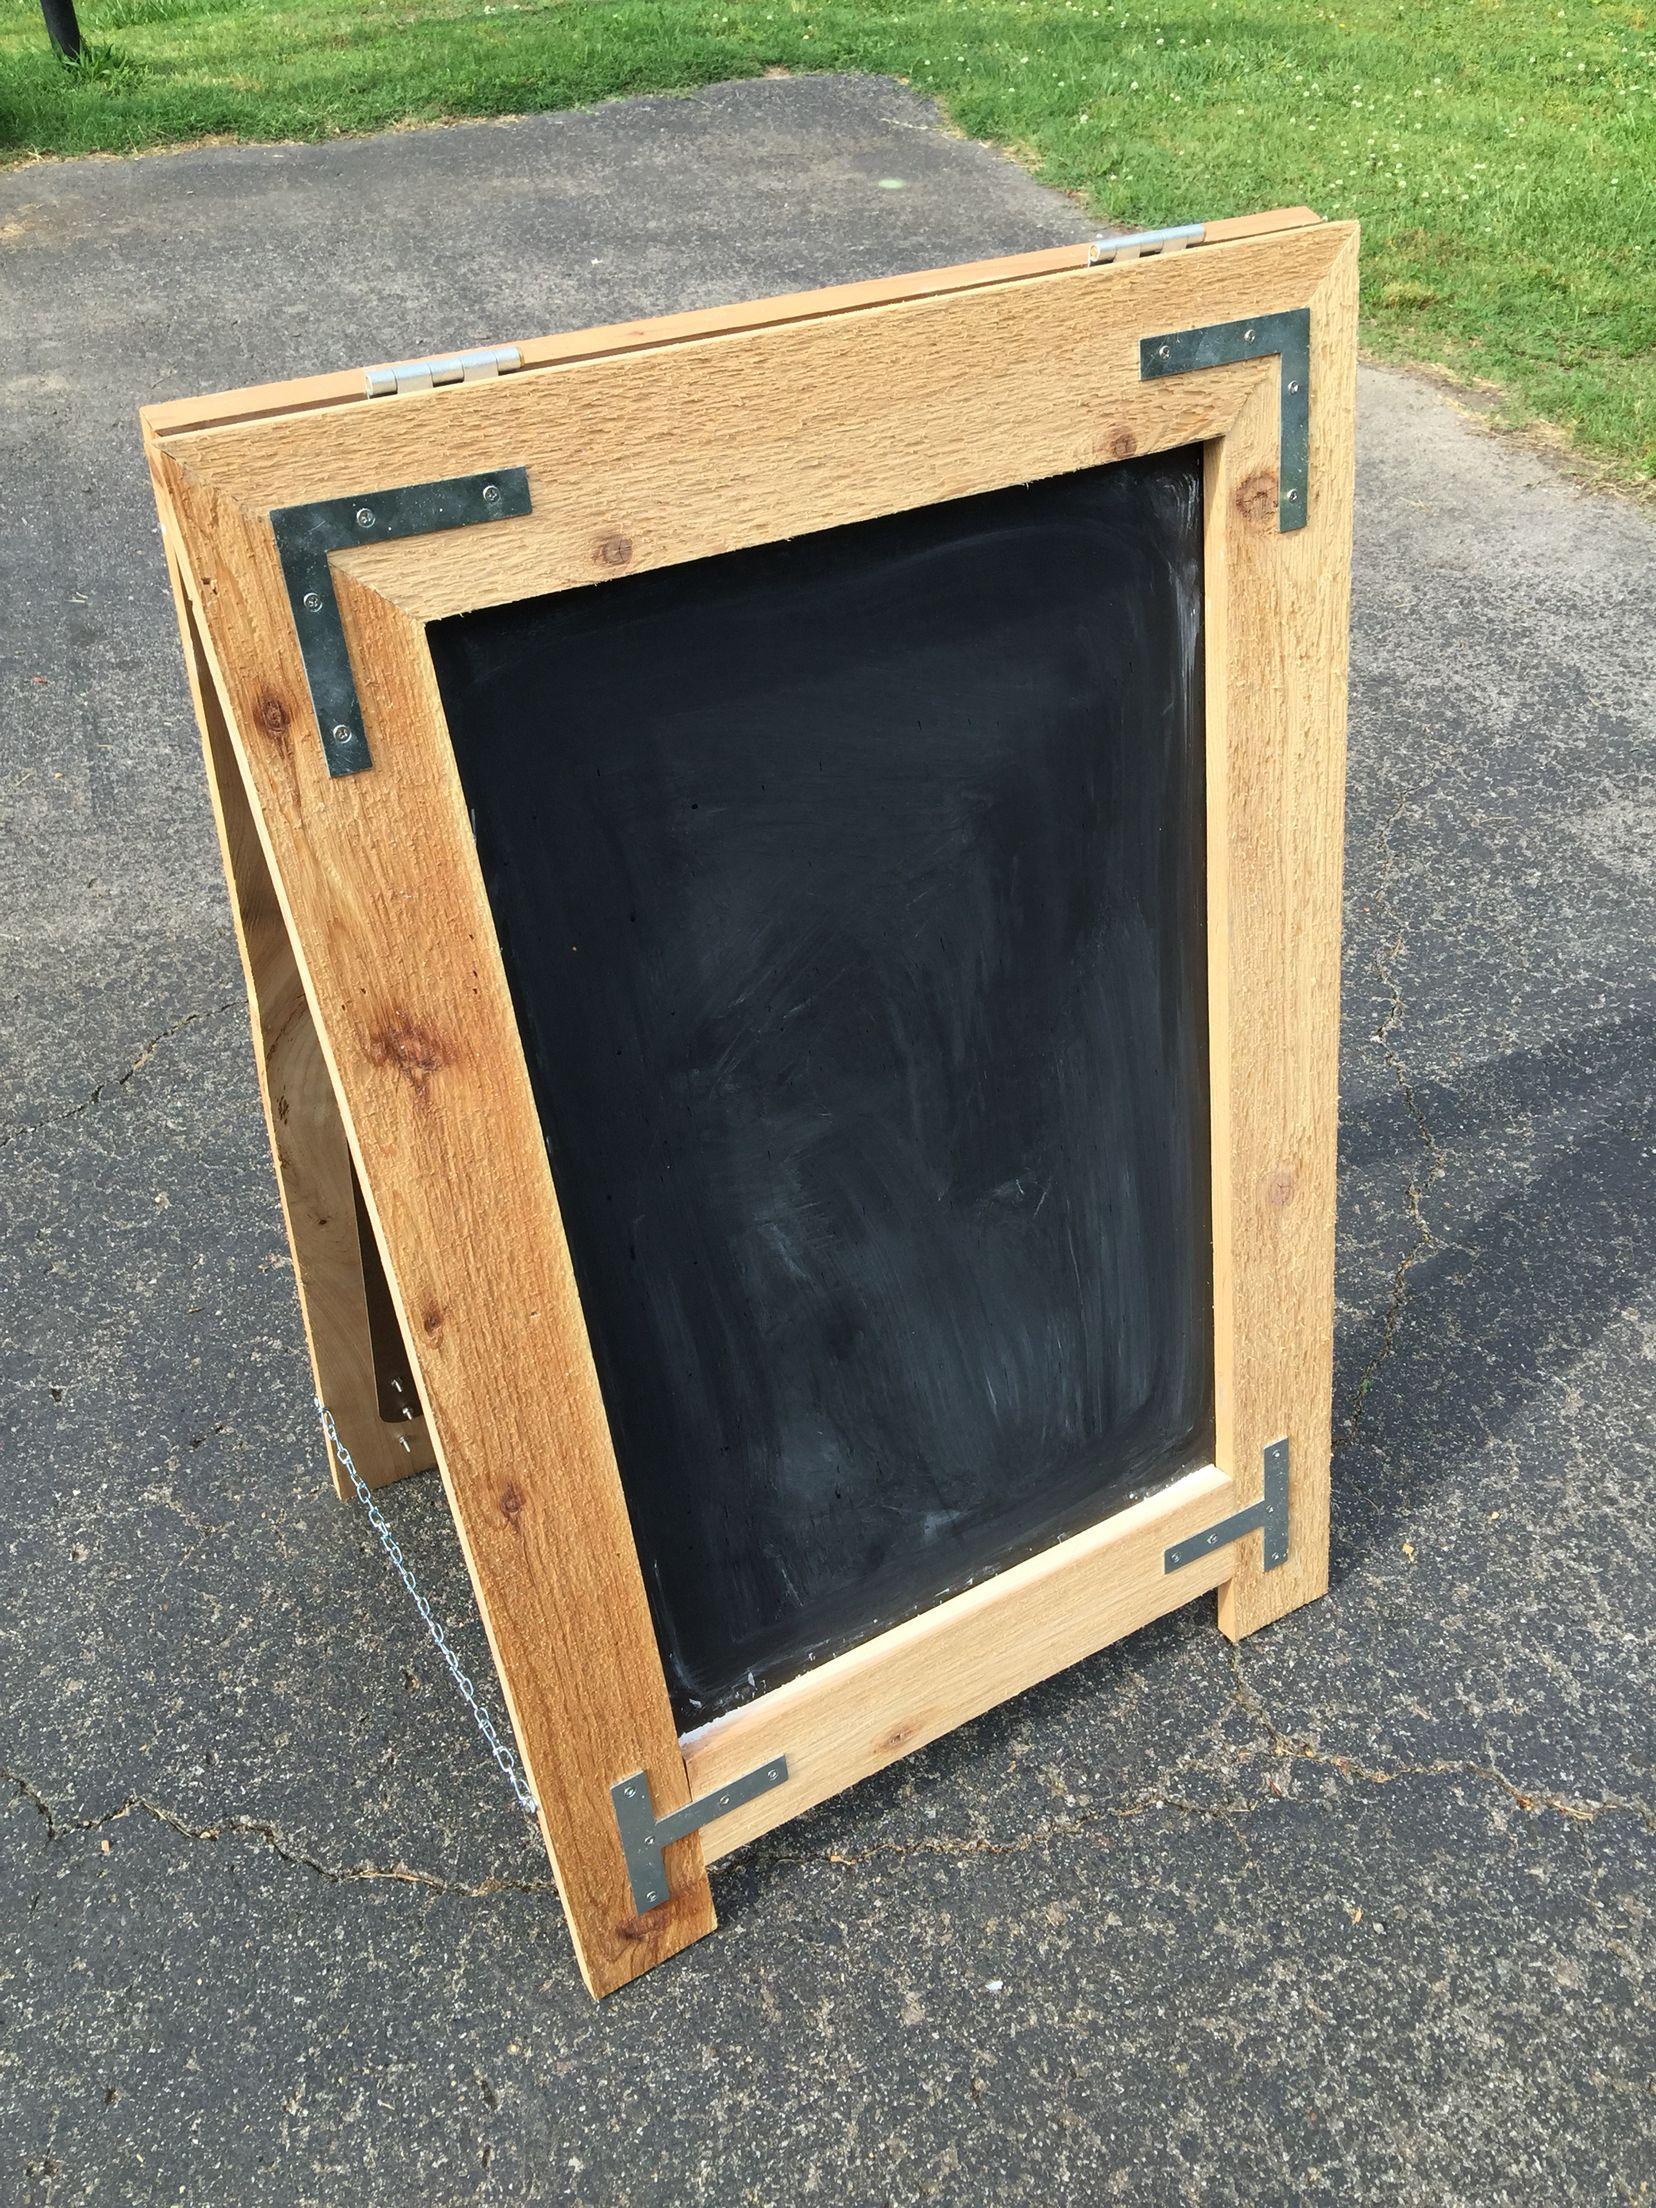 A-frame board I built using cedar boards, metal braces, liquid nails ...